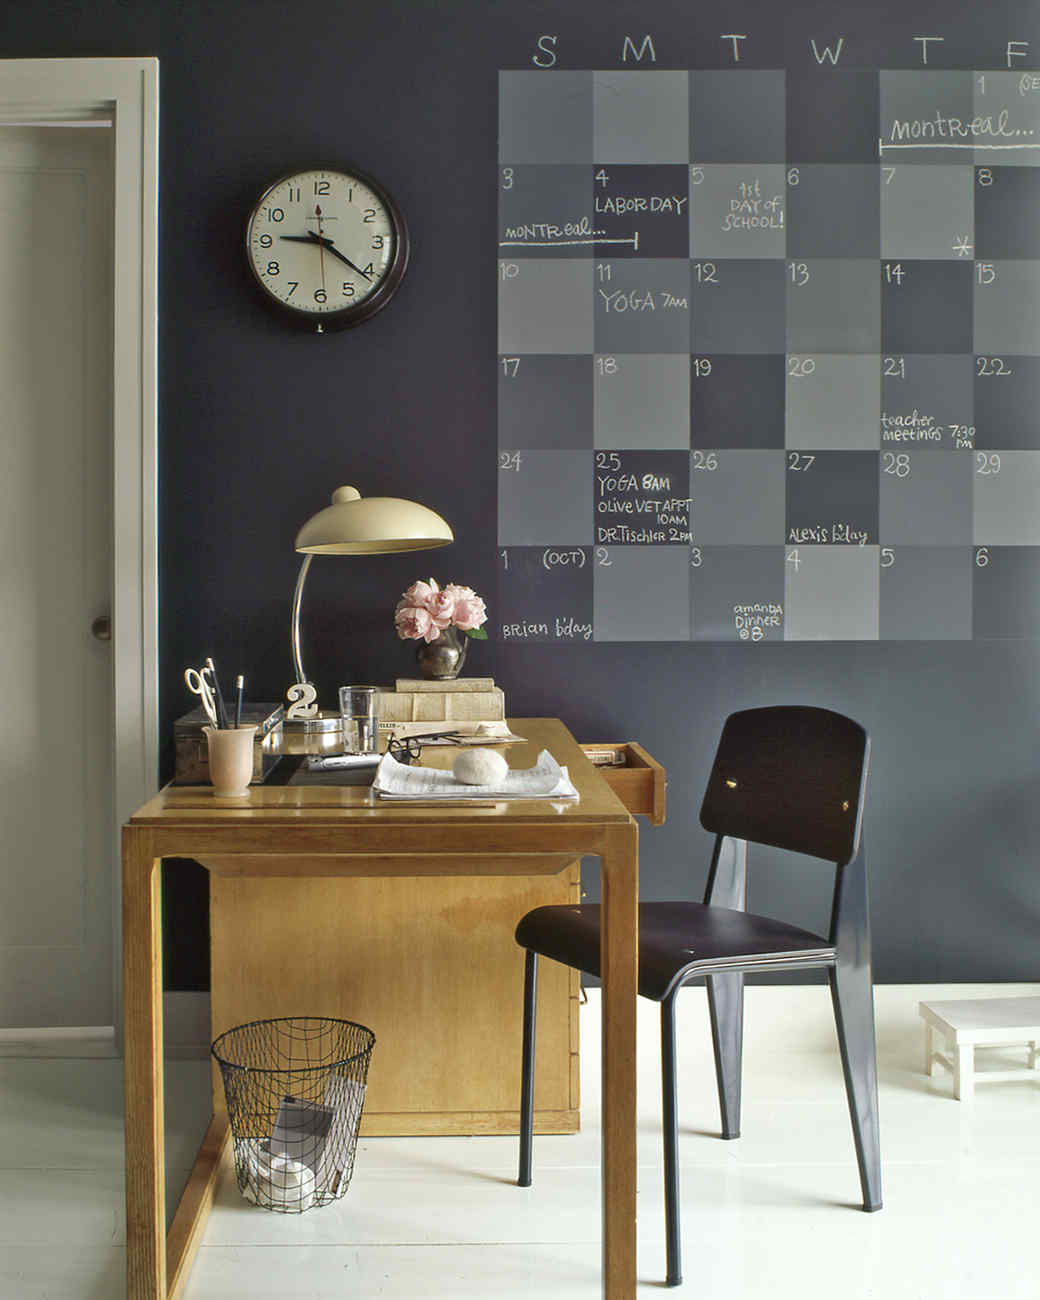 Calendar Ideas For Home : Chalkboard paint home helpers martha stewart